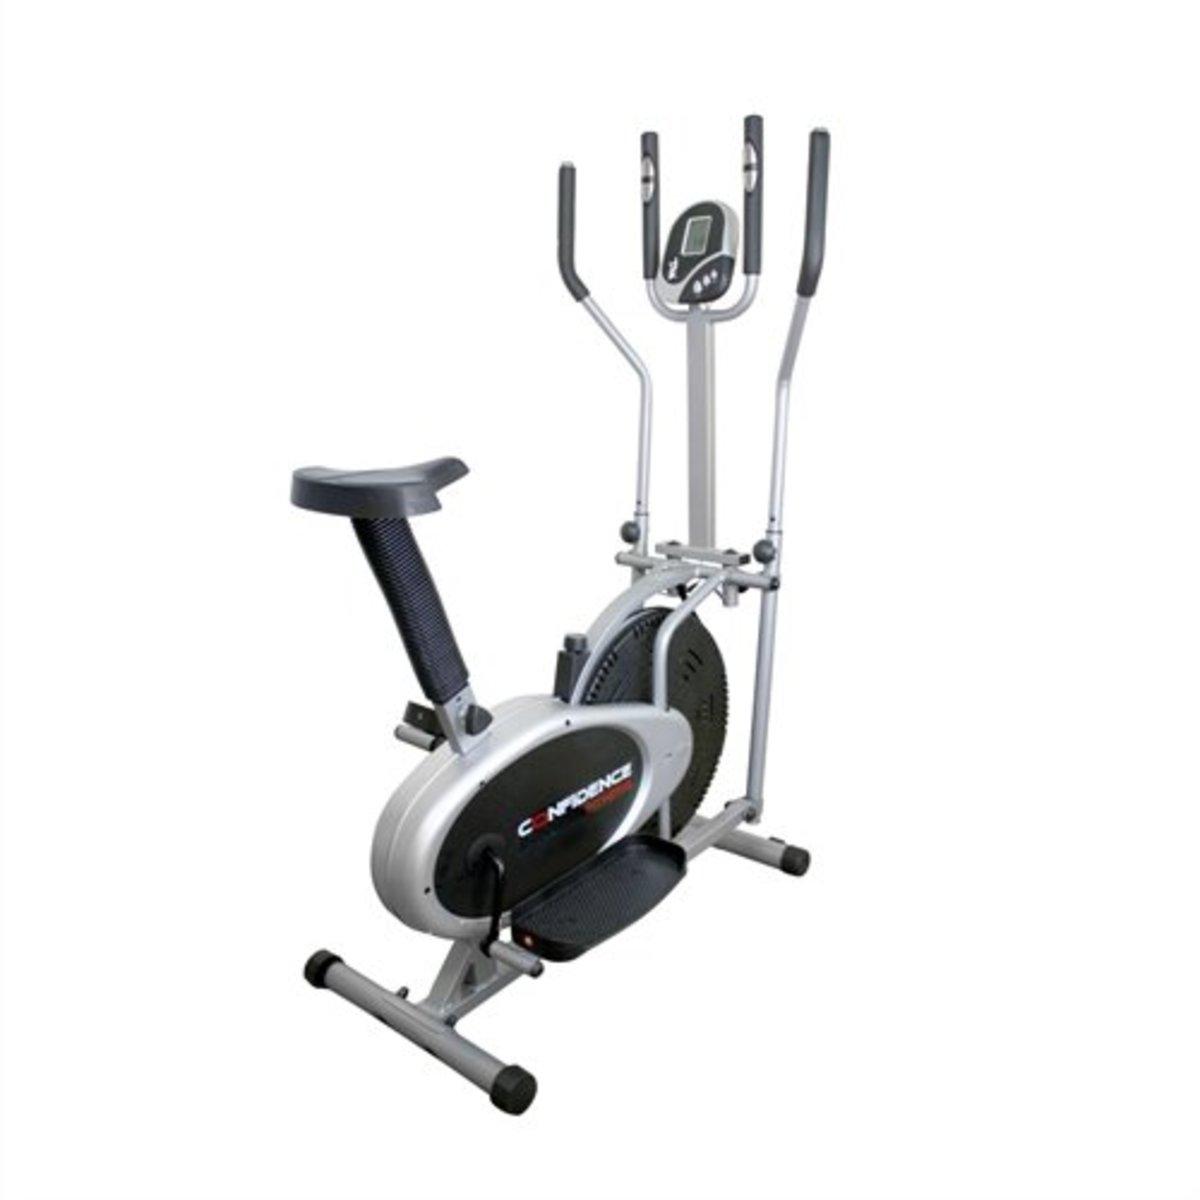 Elliptical Bike For Home Use: 7 Best Compact Portable Elliptical Trainers For Home Use